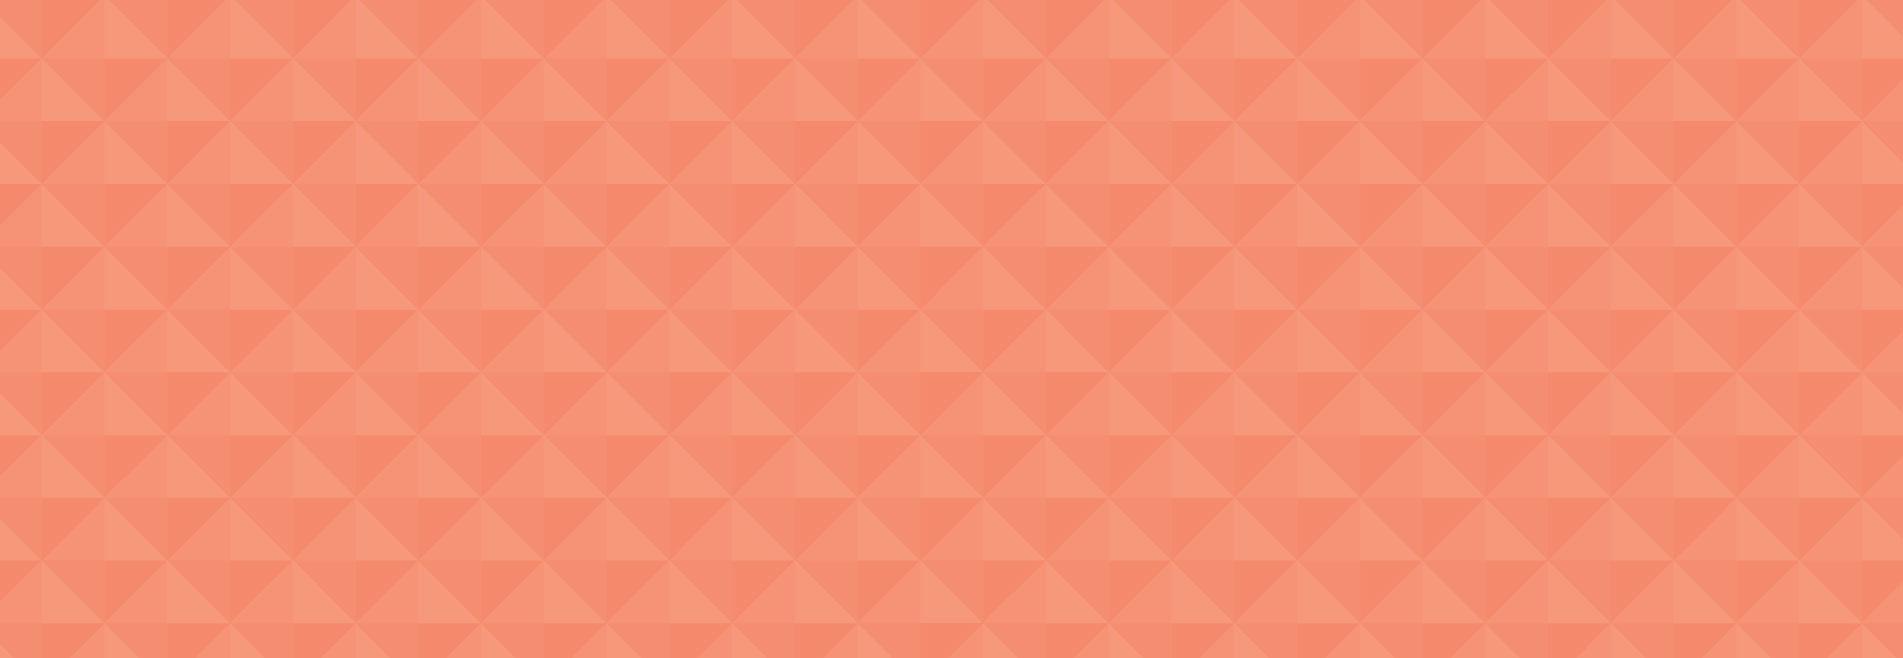 7614_WEB_Covisum_landing-page-graphics_tc-middle.jpg